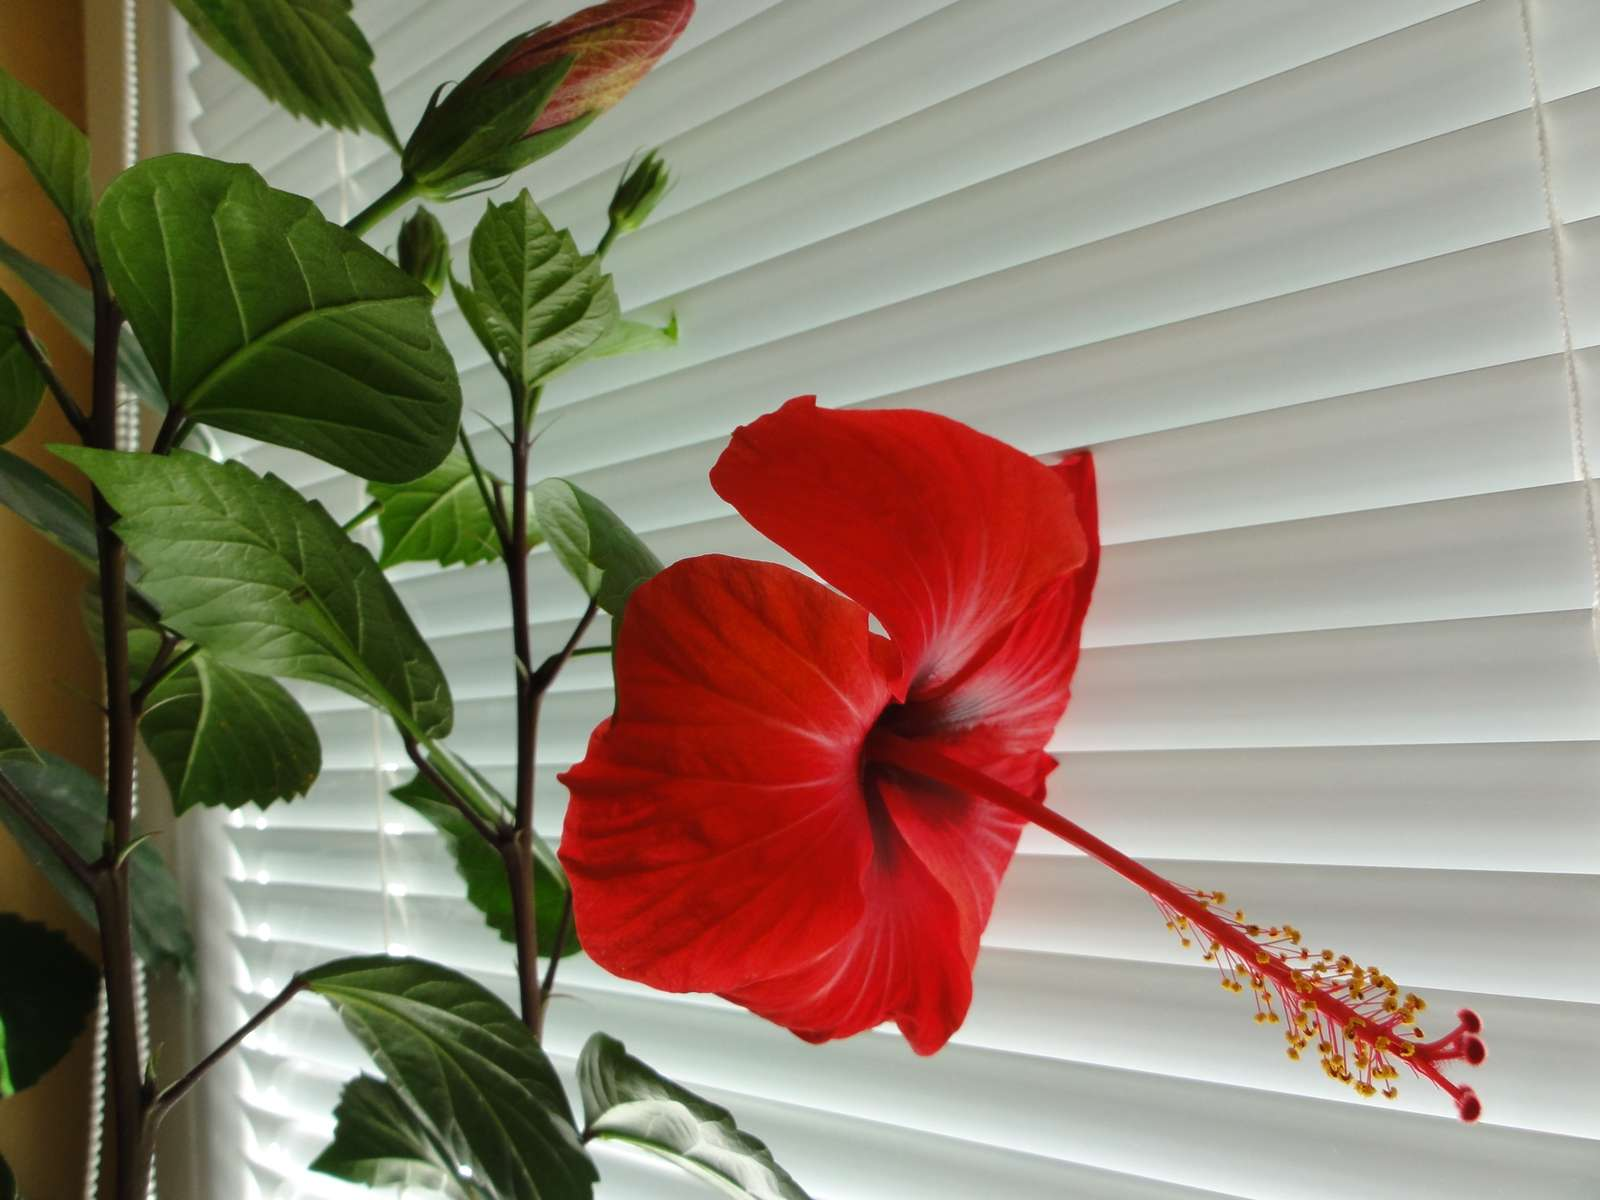 Čínska ruža  /ibištek čínsky/ - Obrázok č. 2